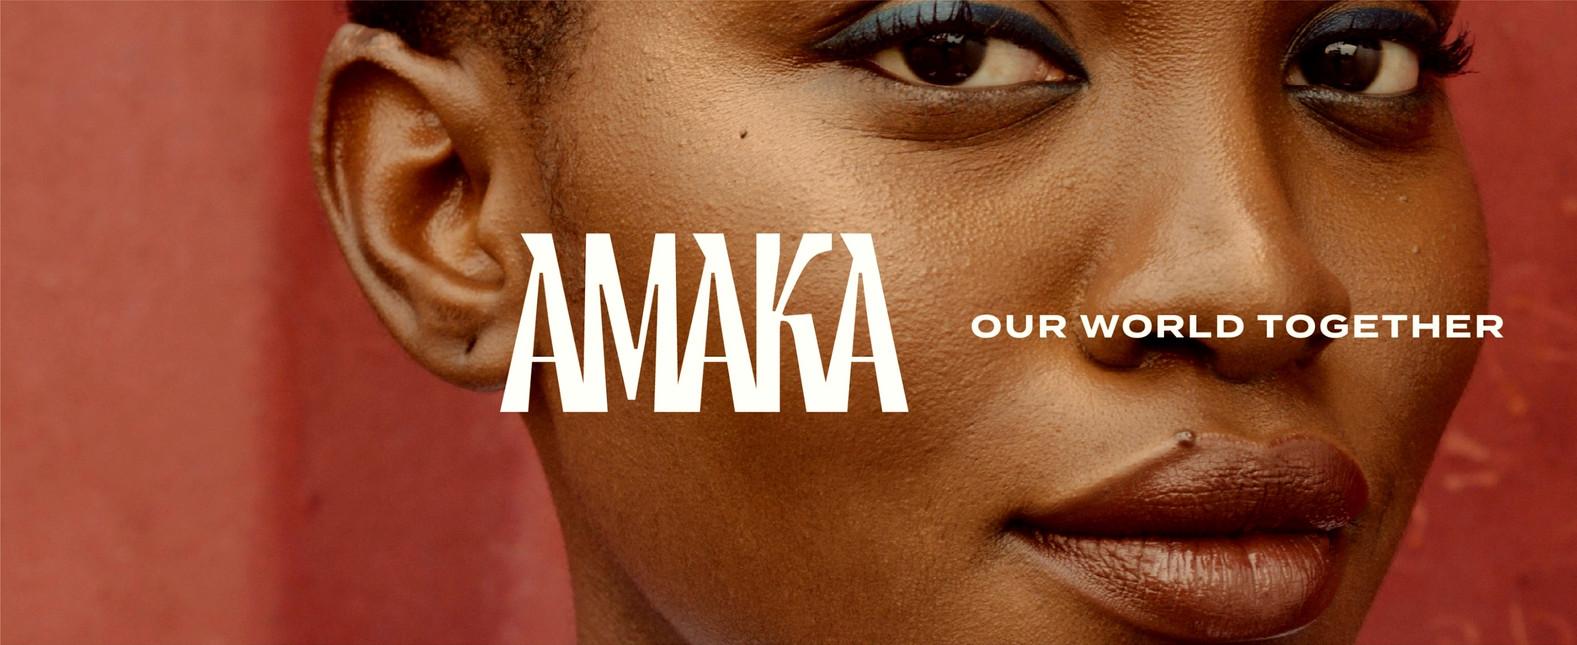 Introduction into AMAKA